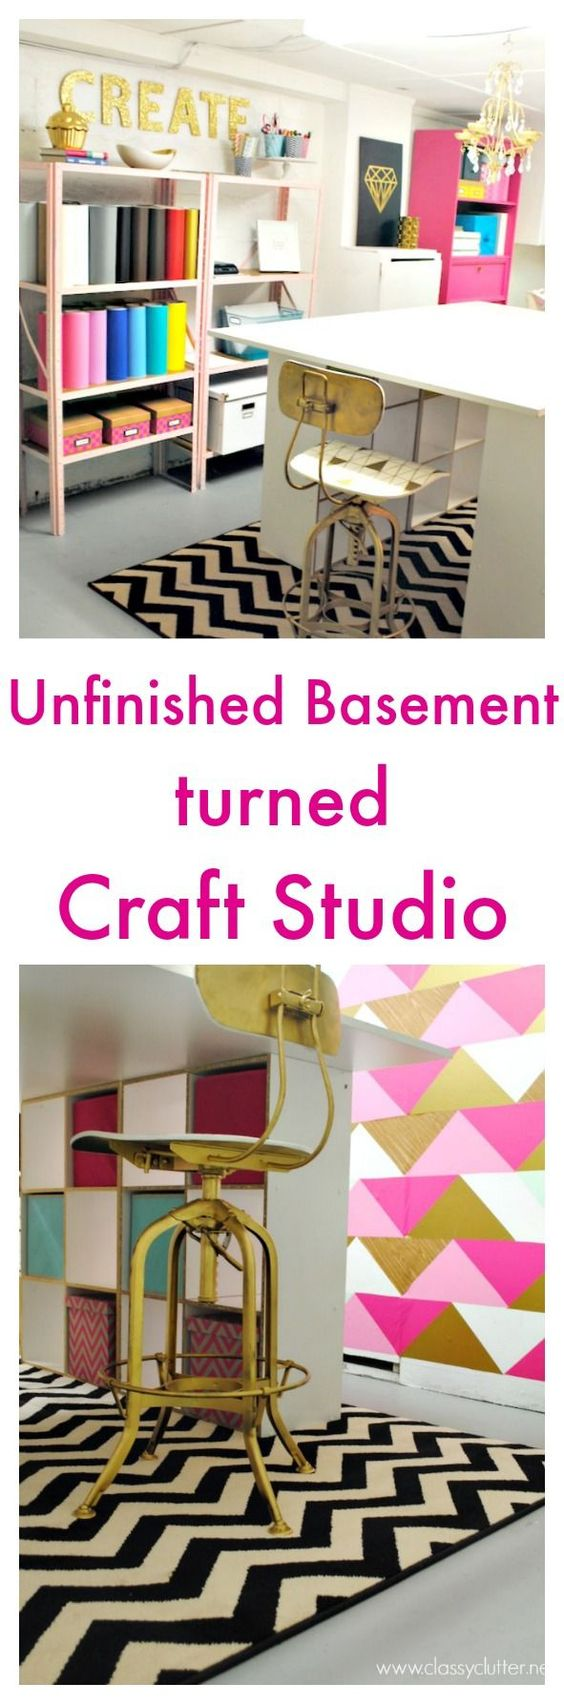 and more crafts studios unfinished basements basements craft studios